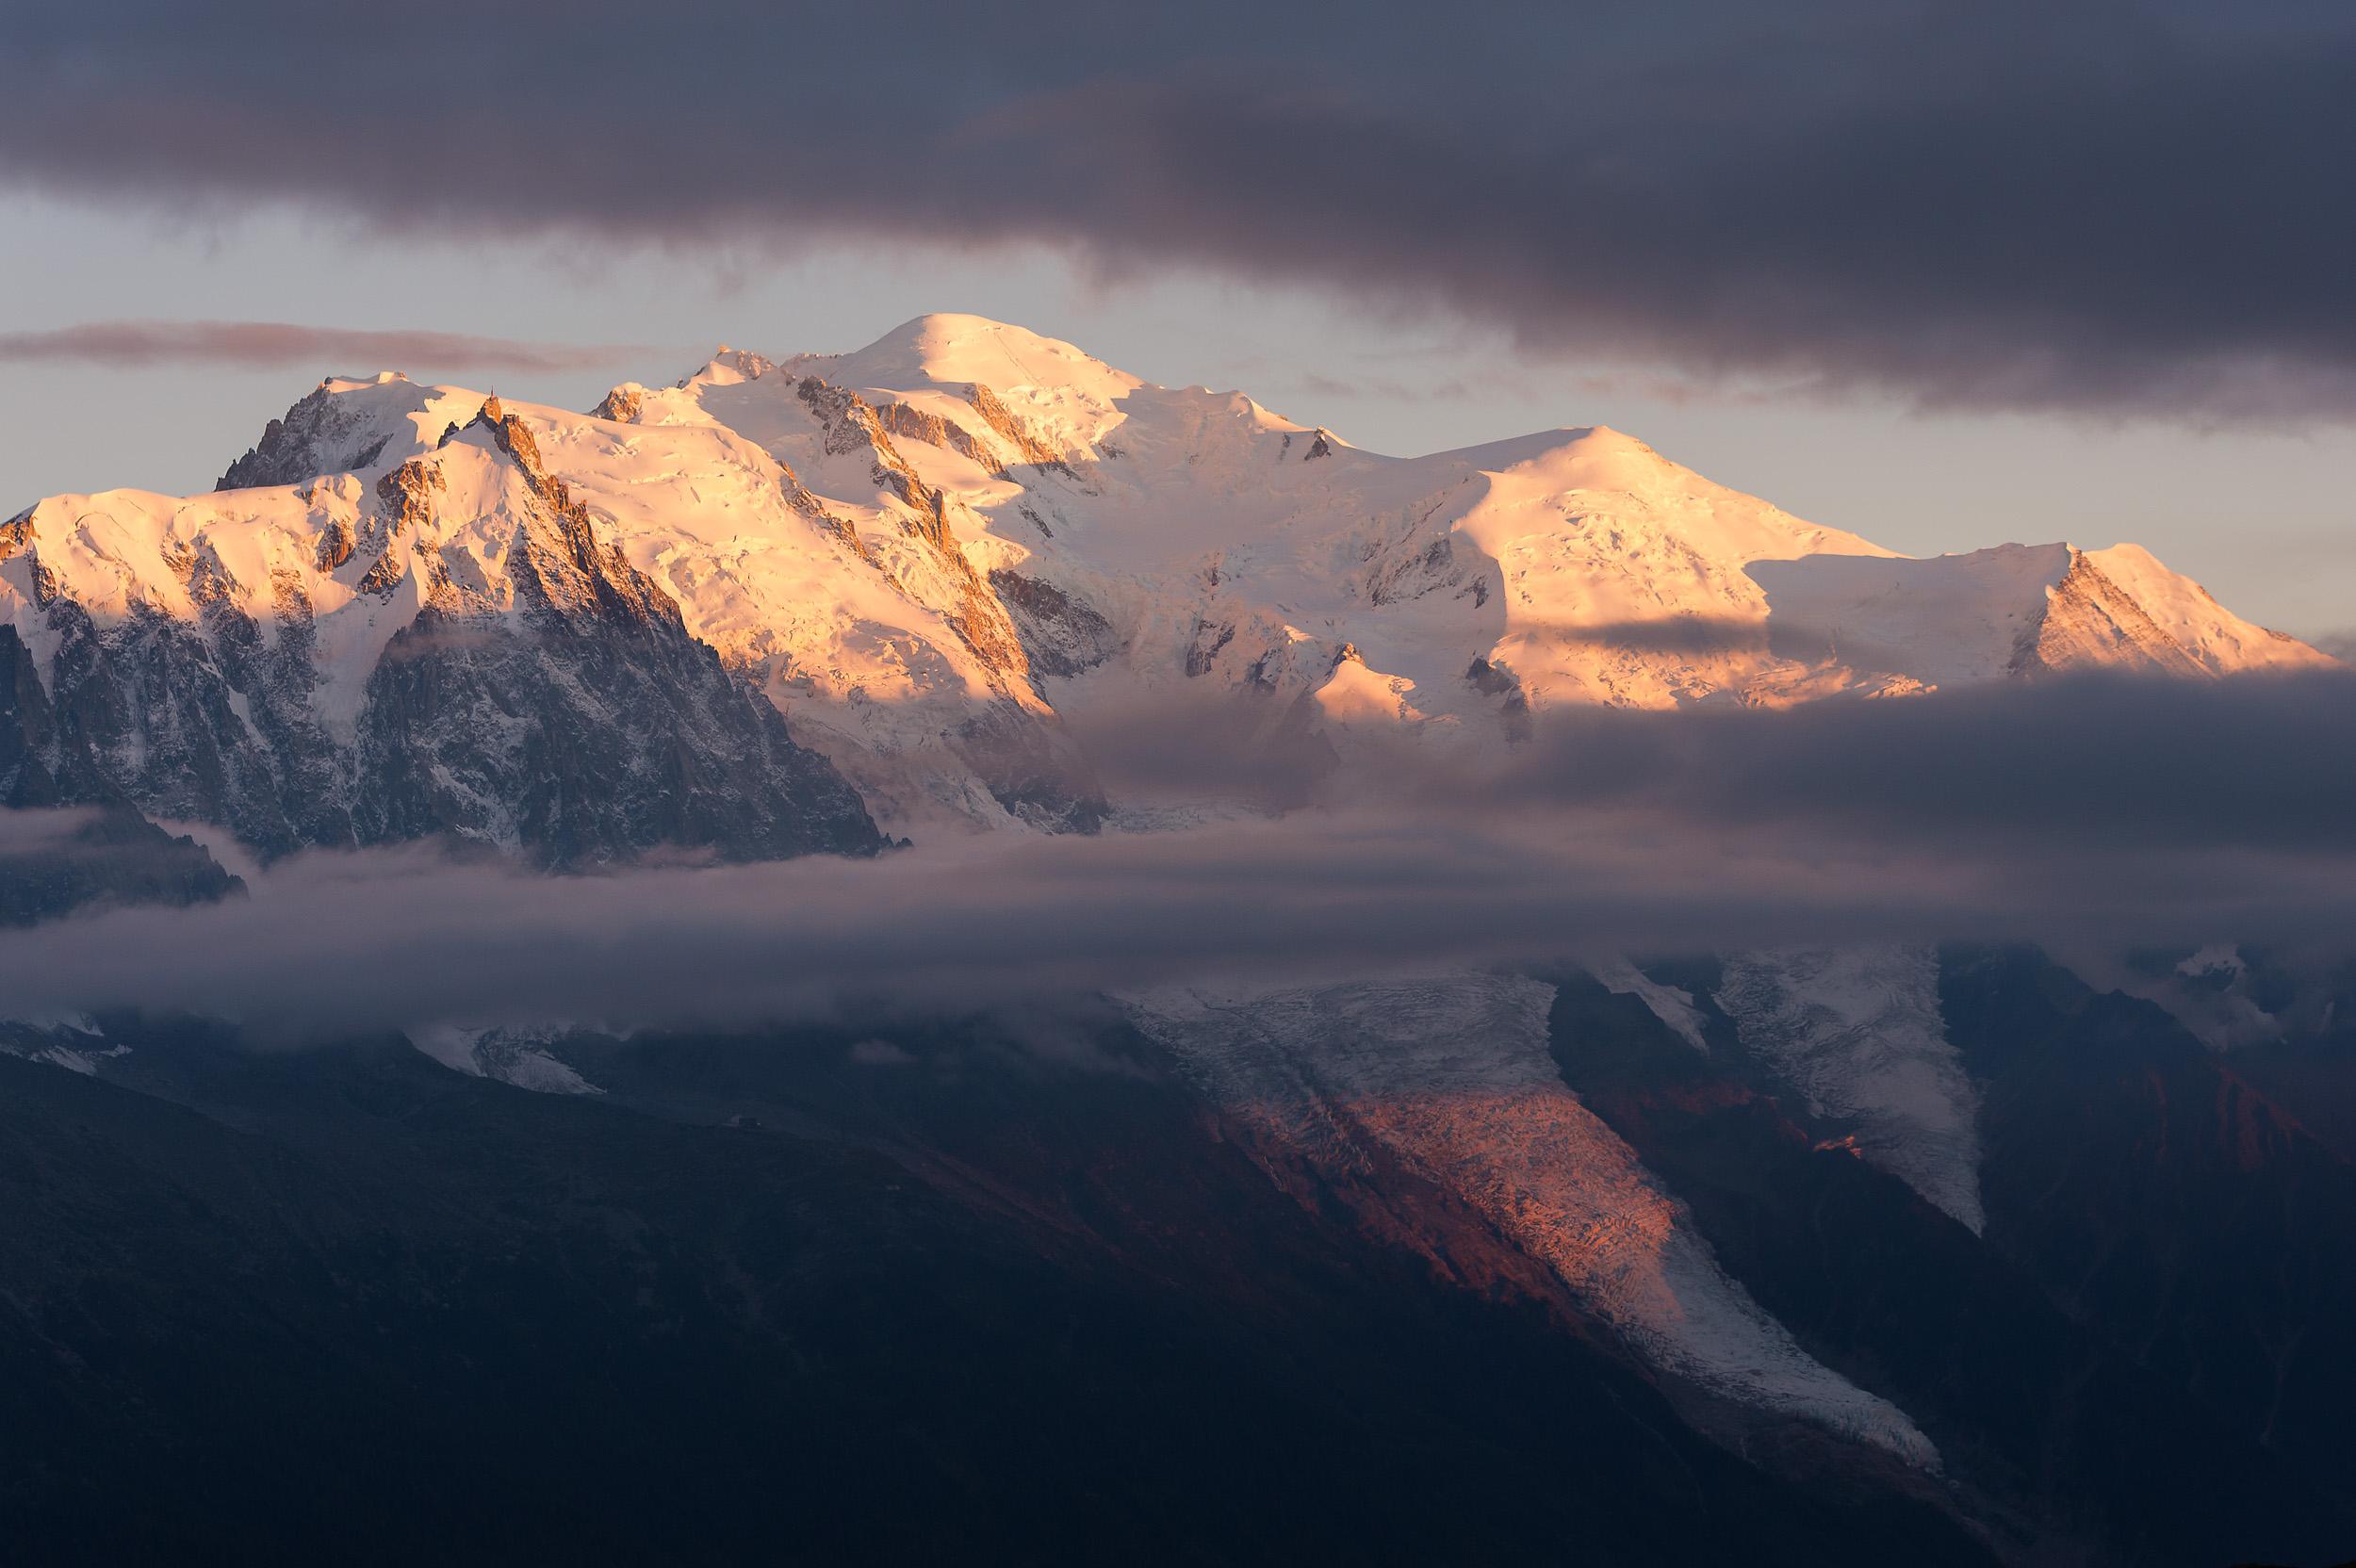 Sunset on Mont Blanc above Chamonix, France.